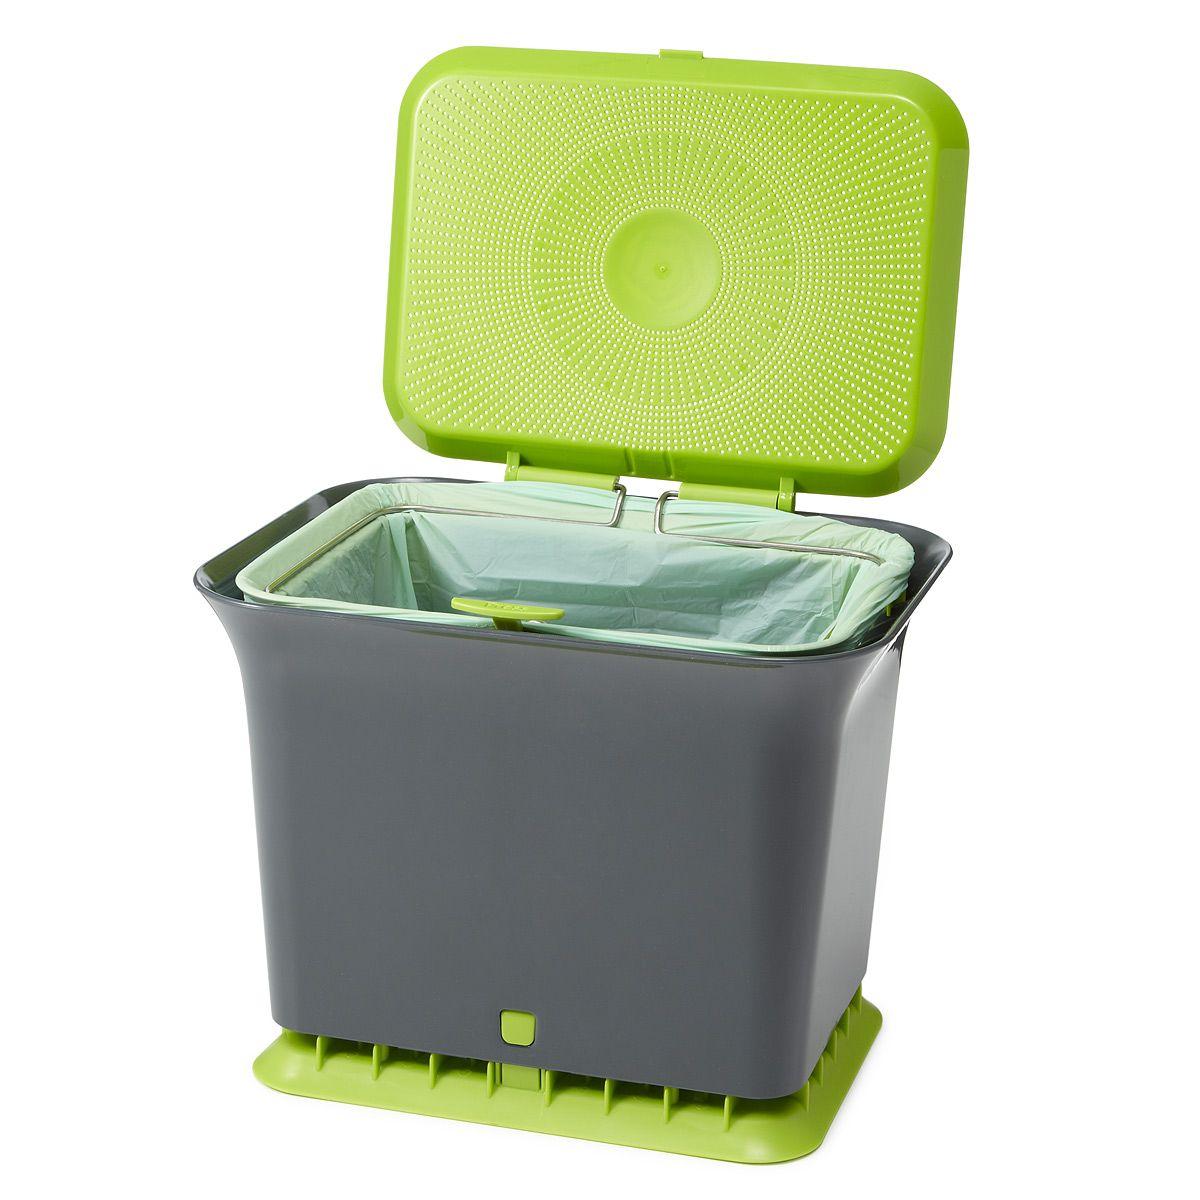 Elegant FRESH AIR COMPOST COLLECTOR | Odor Resistant Compost Container, Odor Free Kitchen  Compost